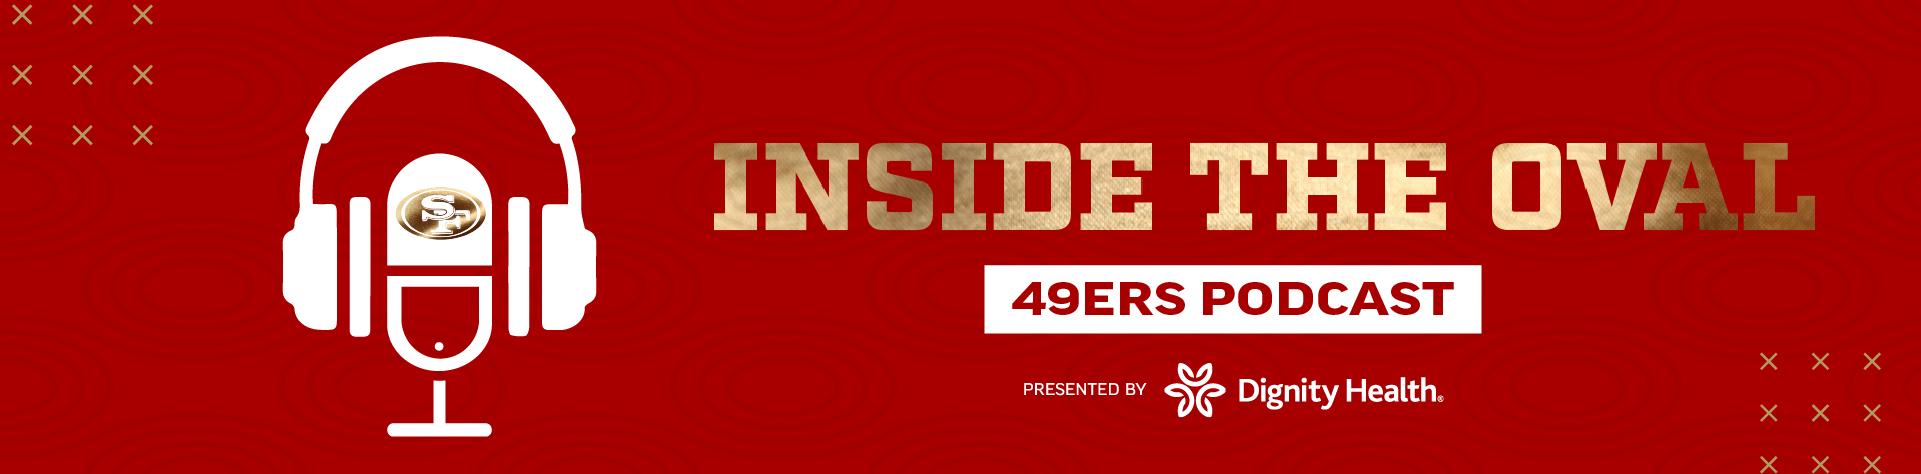 InsideTheOval 49ers Podcast_sponsor-04